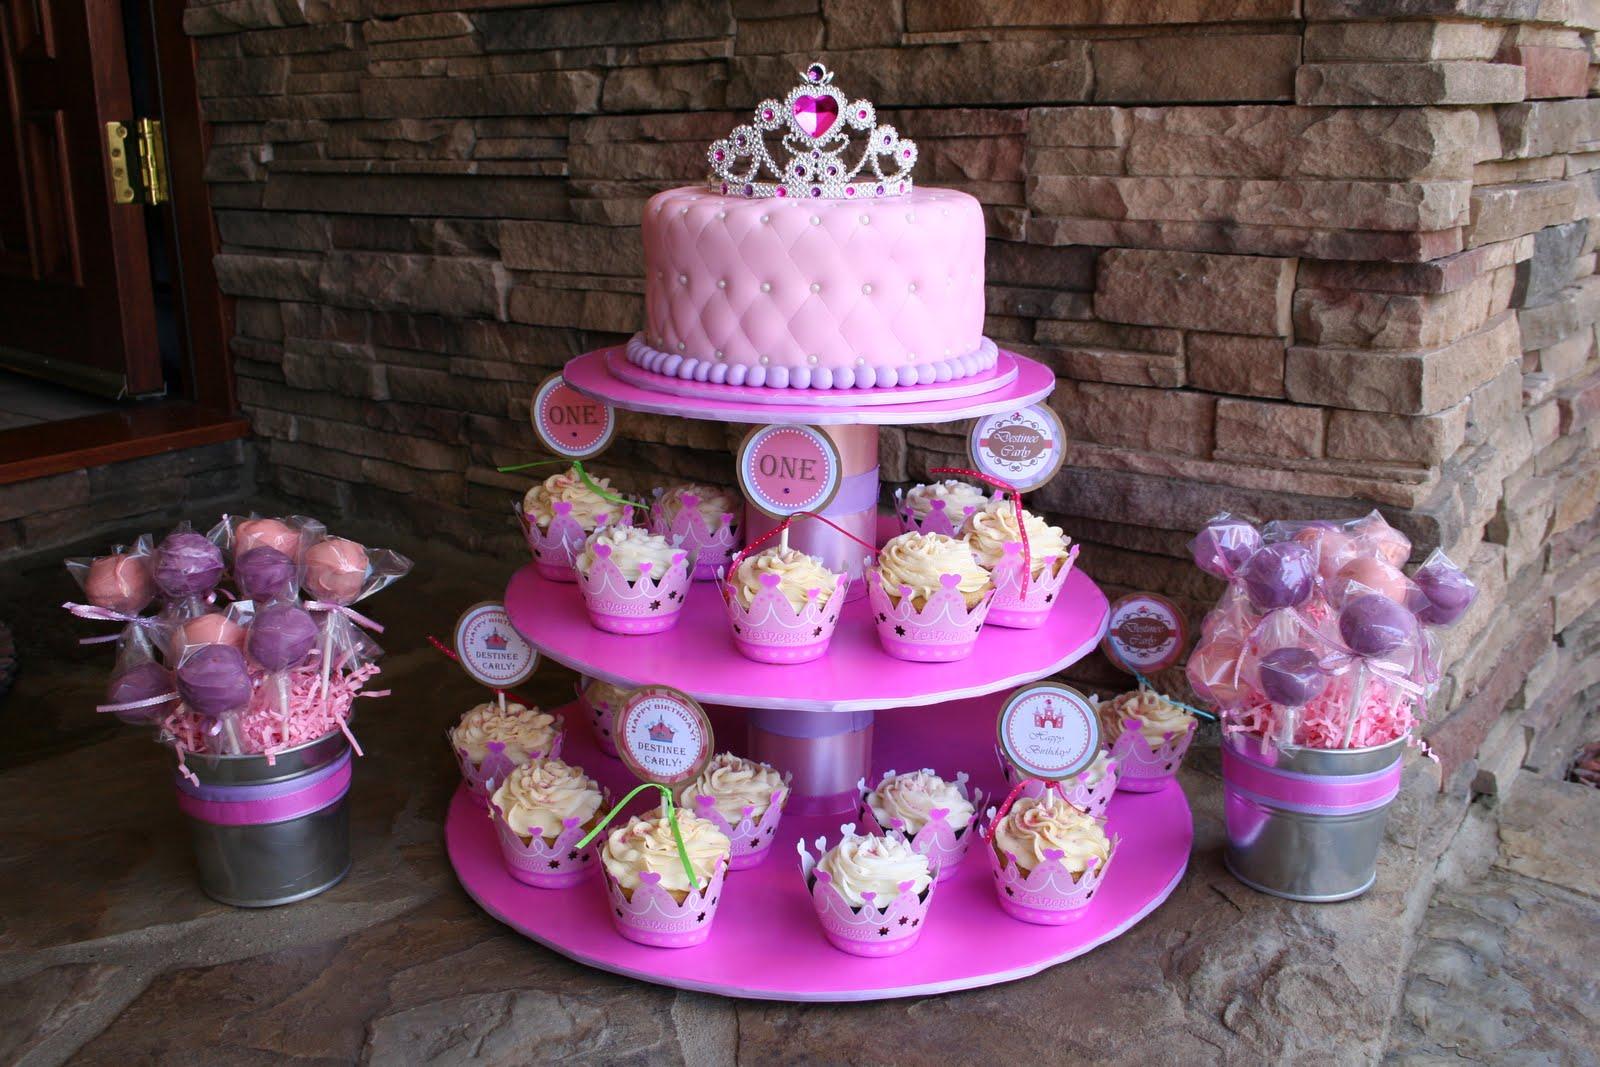 Cakes By Narleen Kristel: A Princess' 1st Birthday